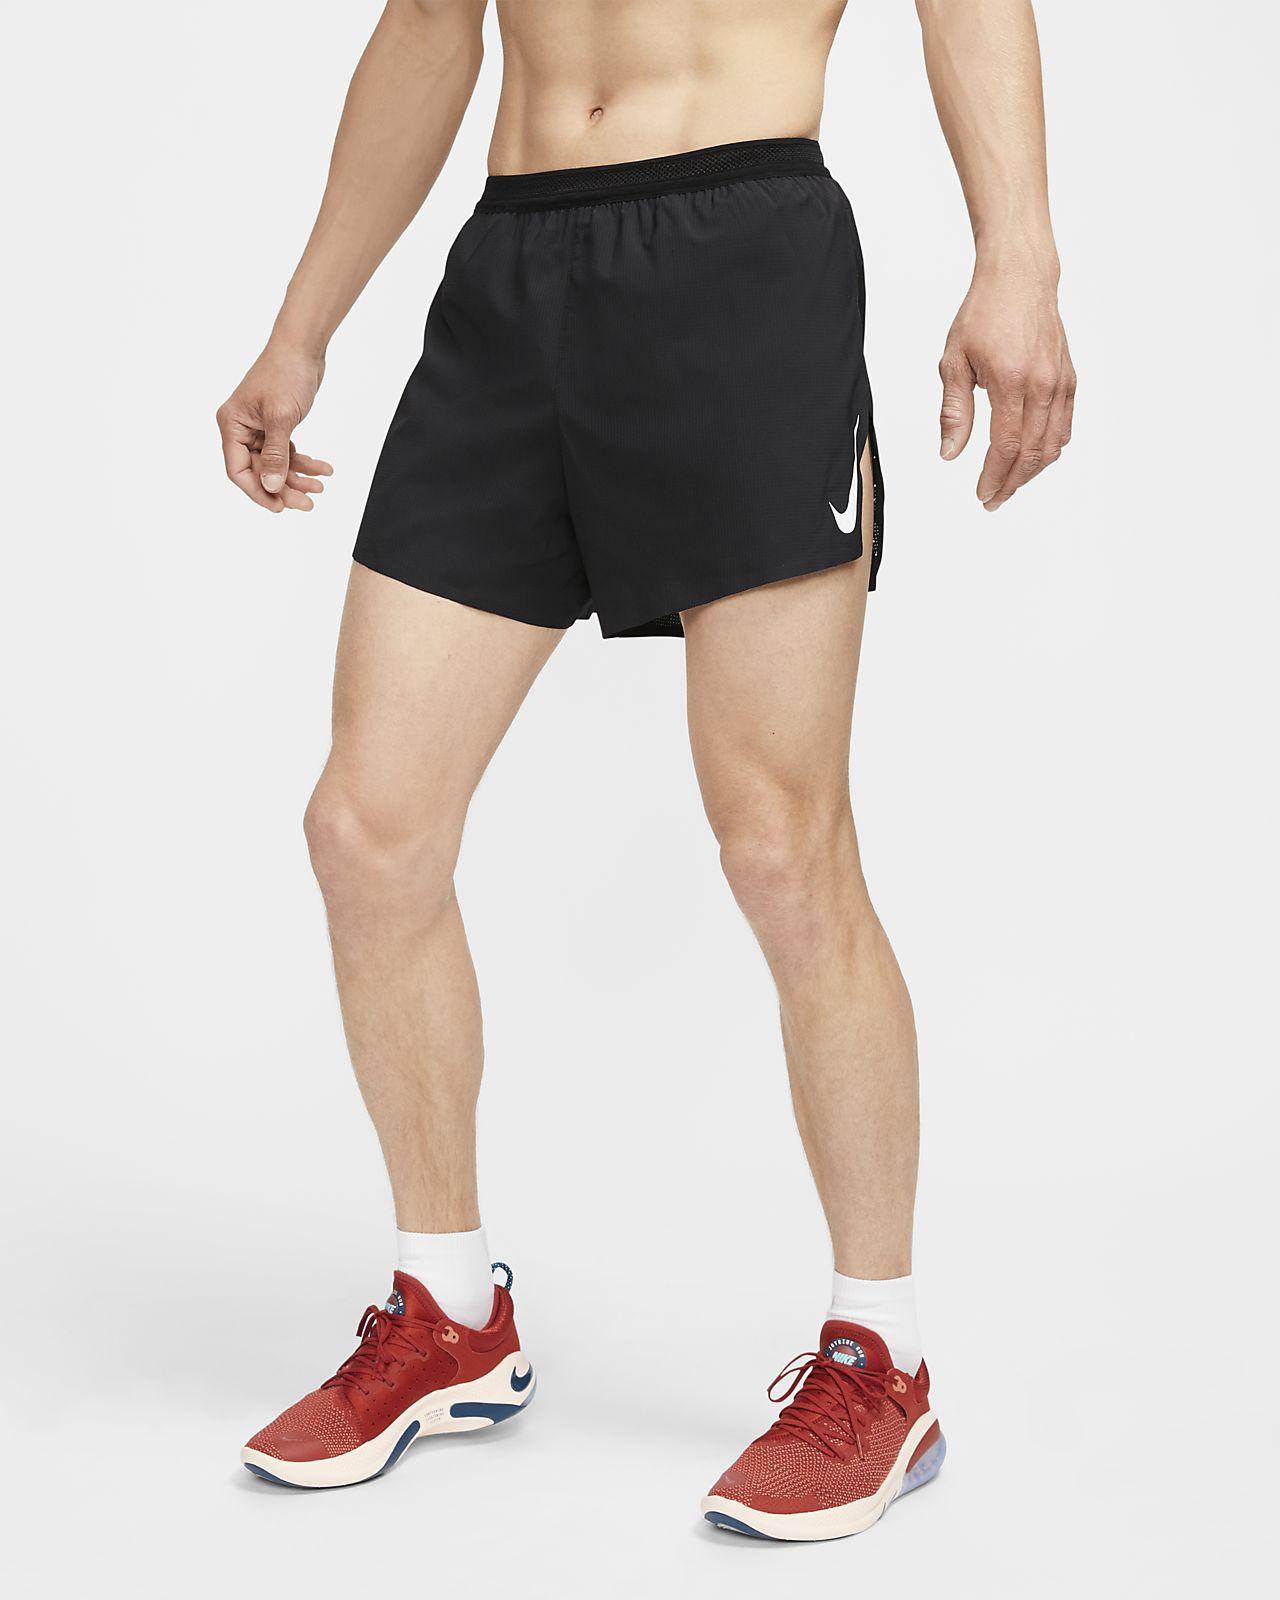 Nike AeroSwift 10 cm-es férfi futórövidnadrág